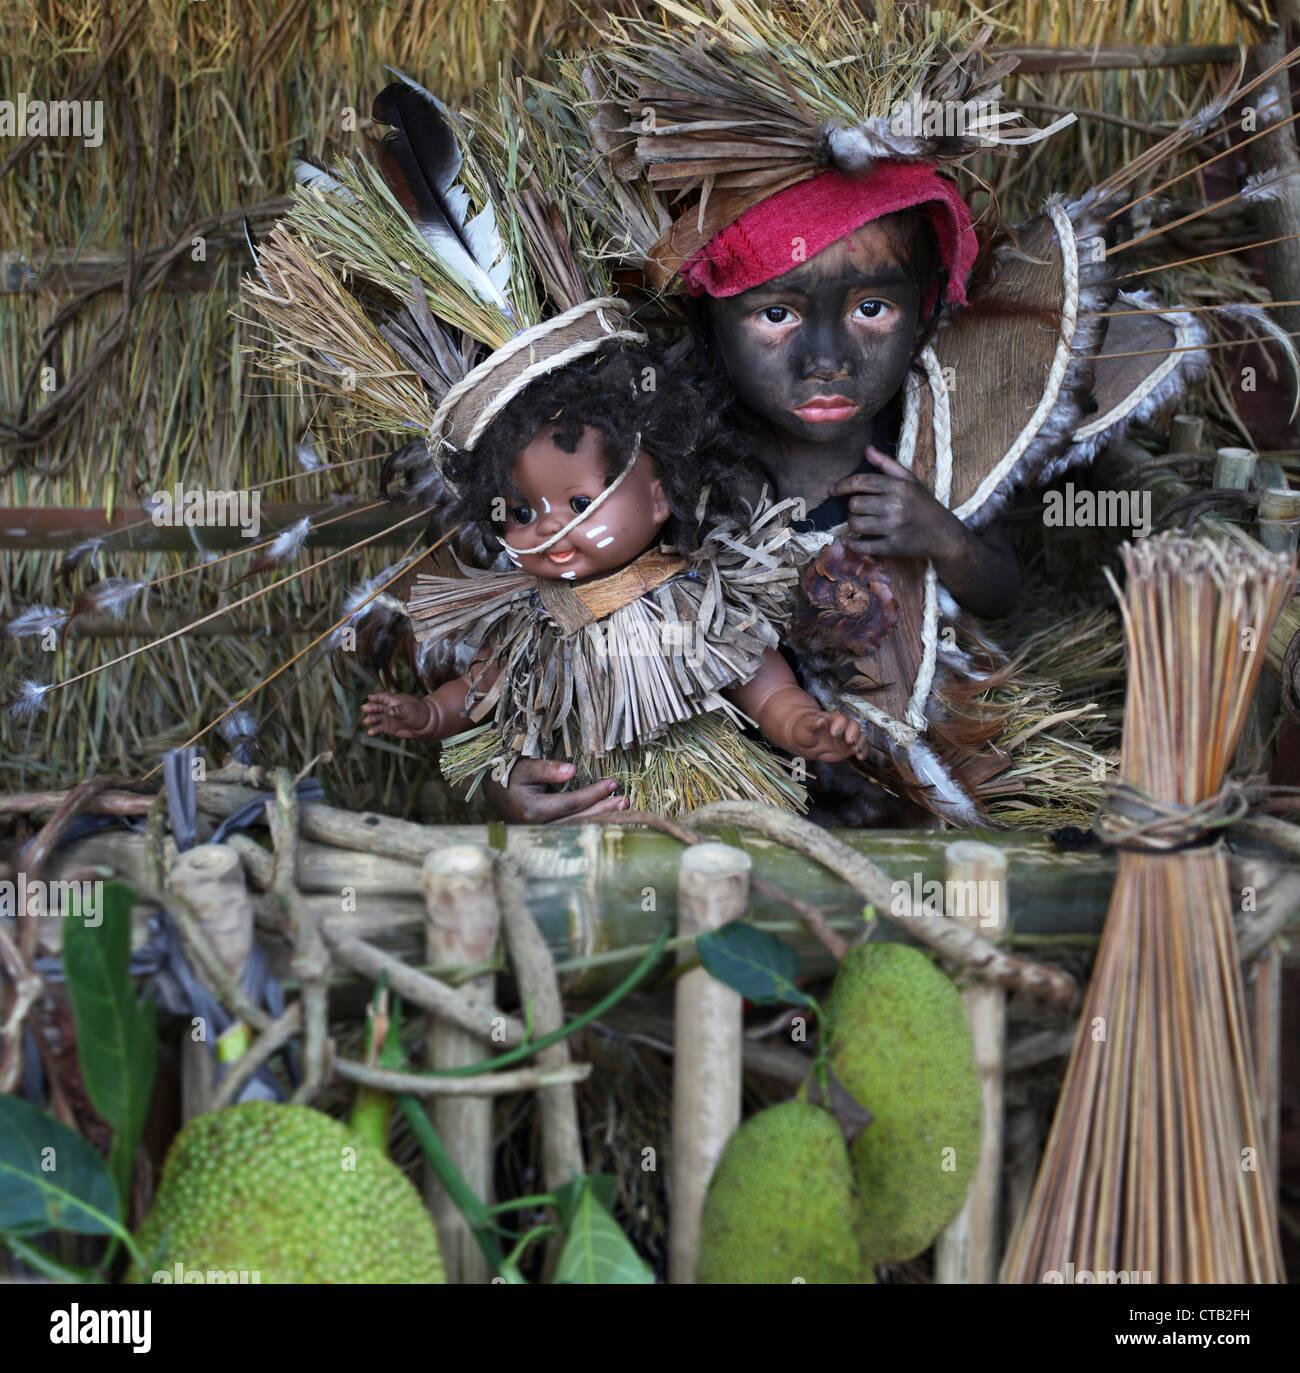 Bambina con bambola come simbolo del Santo Nino figura, Ati Atihan festival, Ibaja, Aklan, Panay Island, Asiay, Immagini Stock